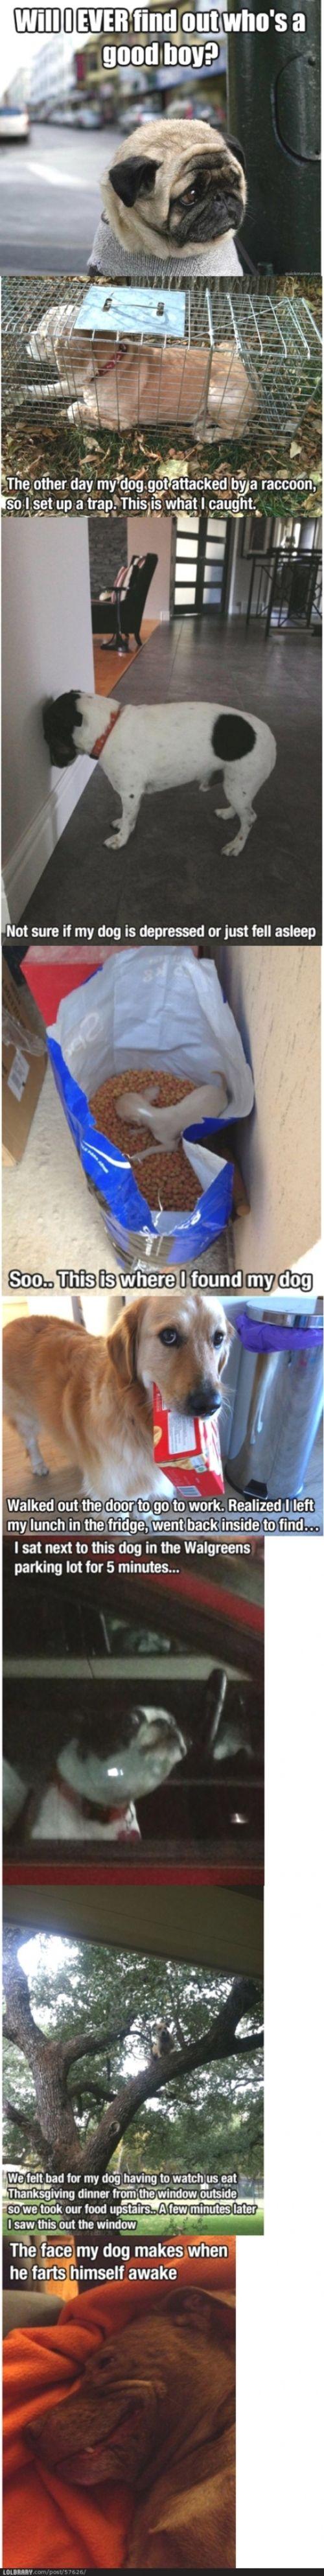 So doggon funny